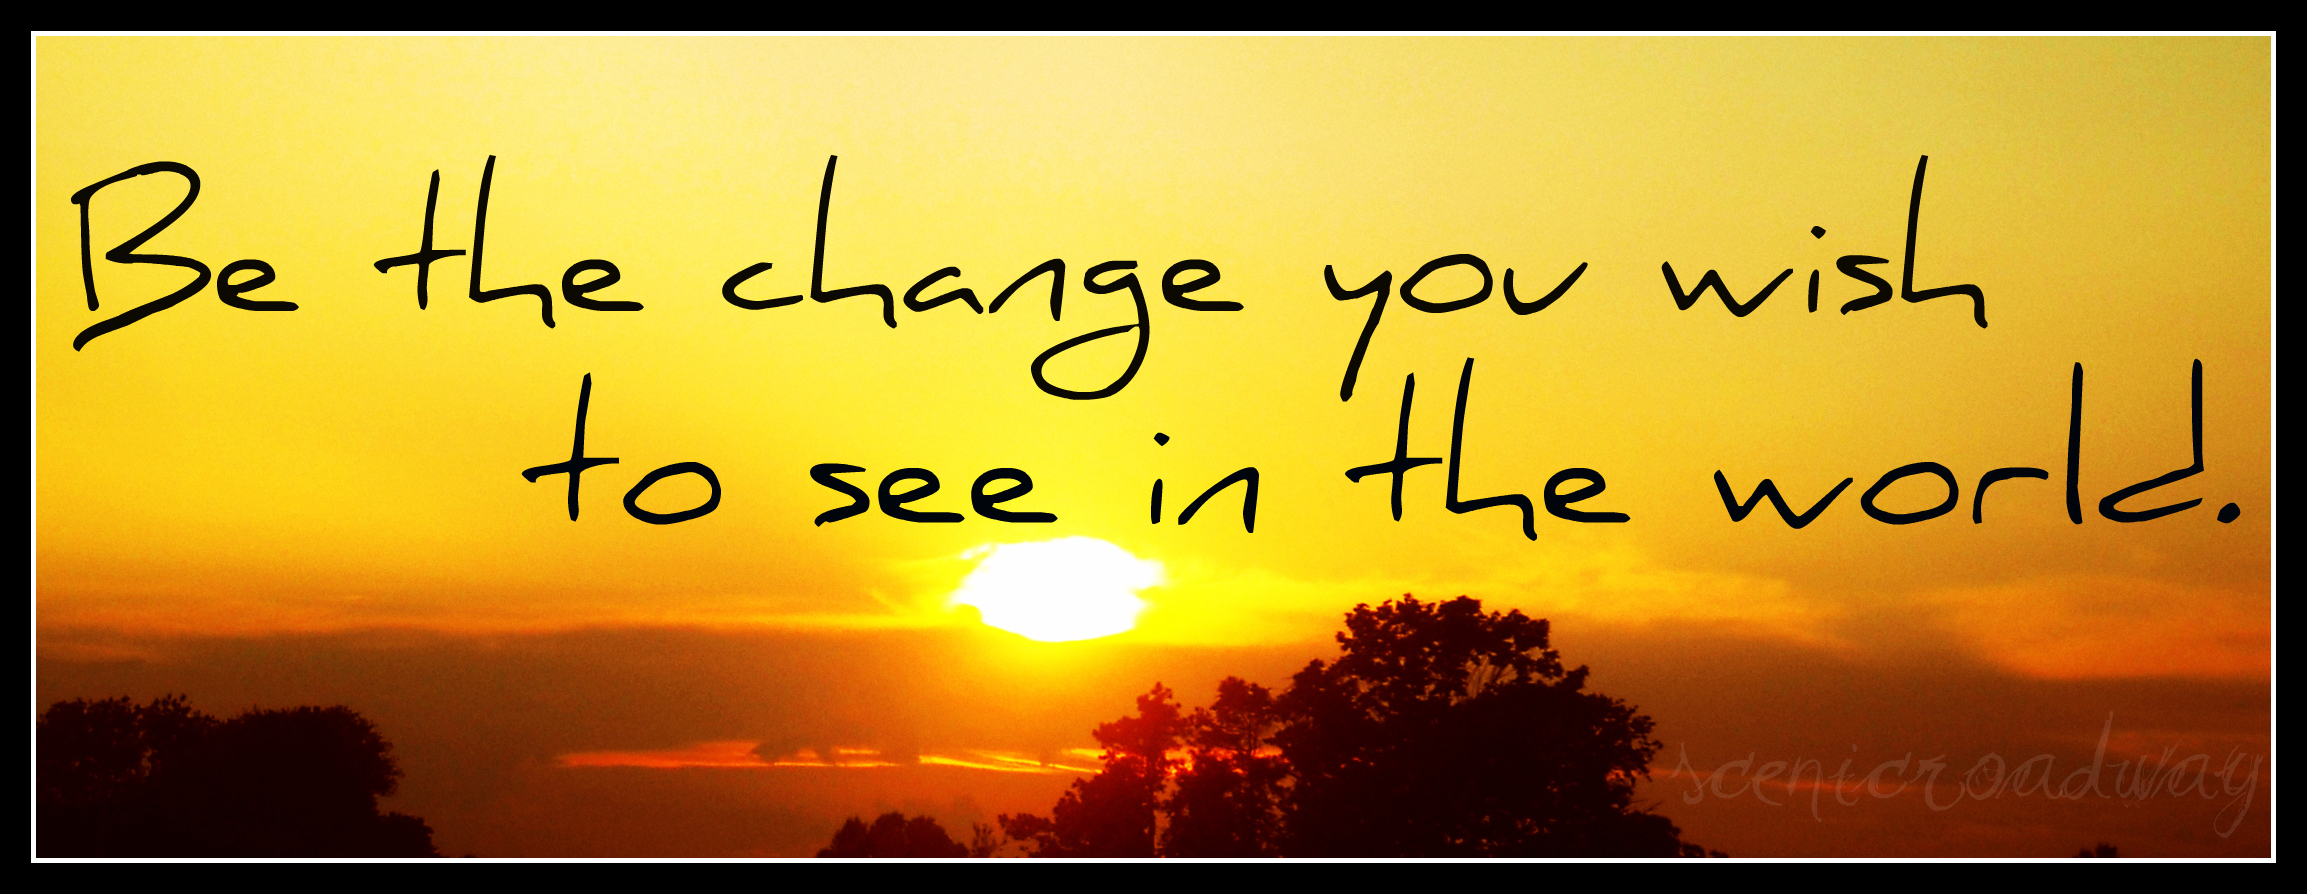 Change Inspirational Quotes Life. QuotesGram